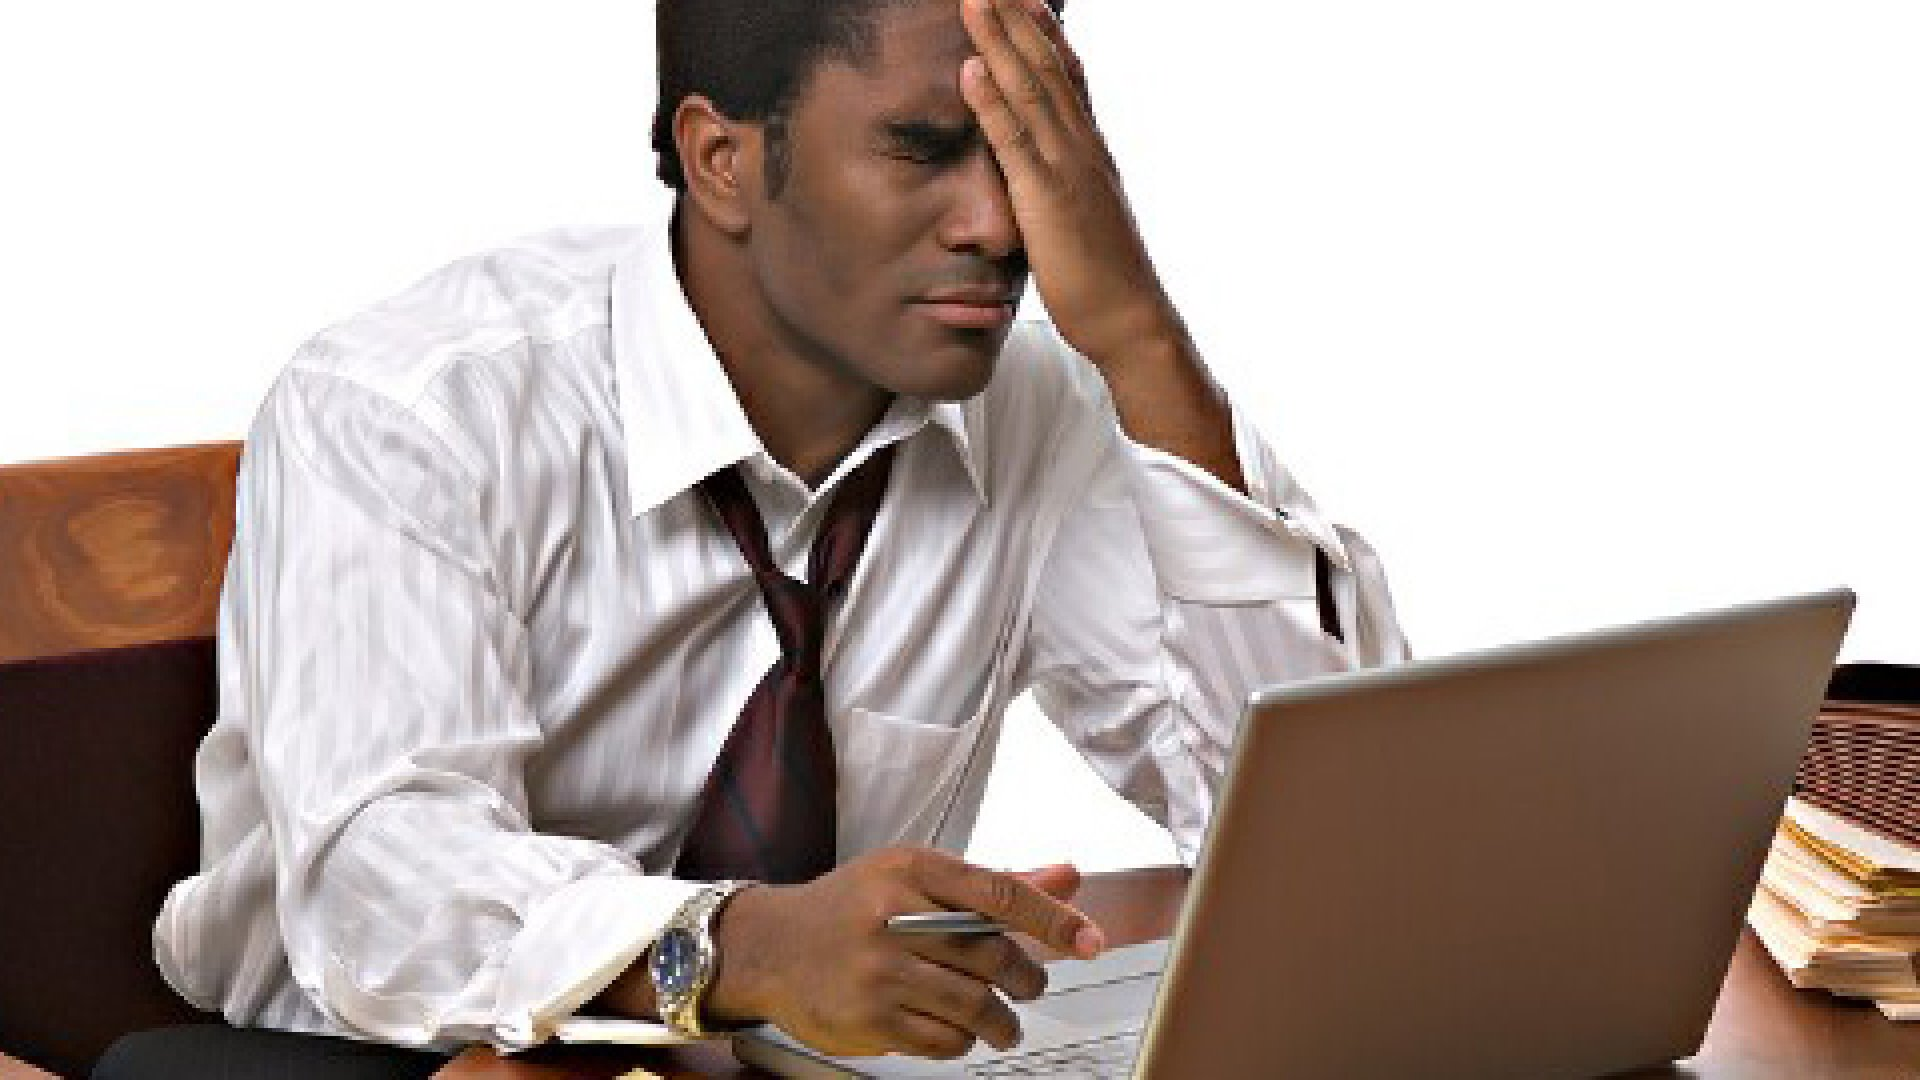 5 Emails You Should Never Send